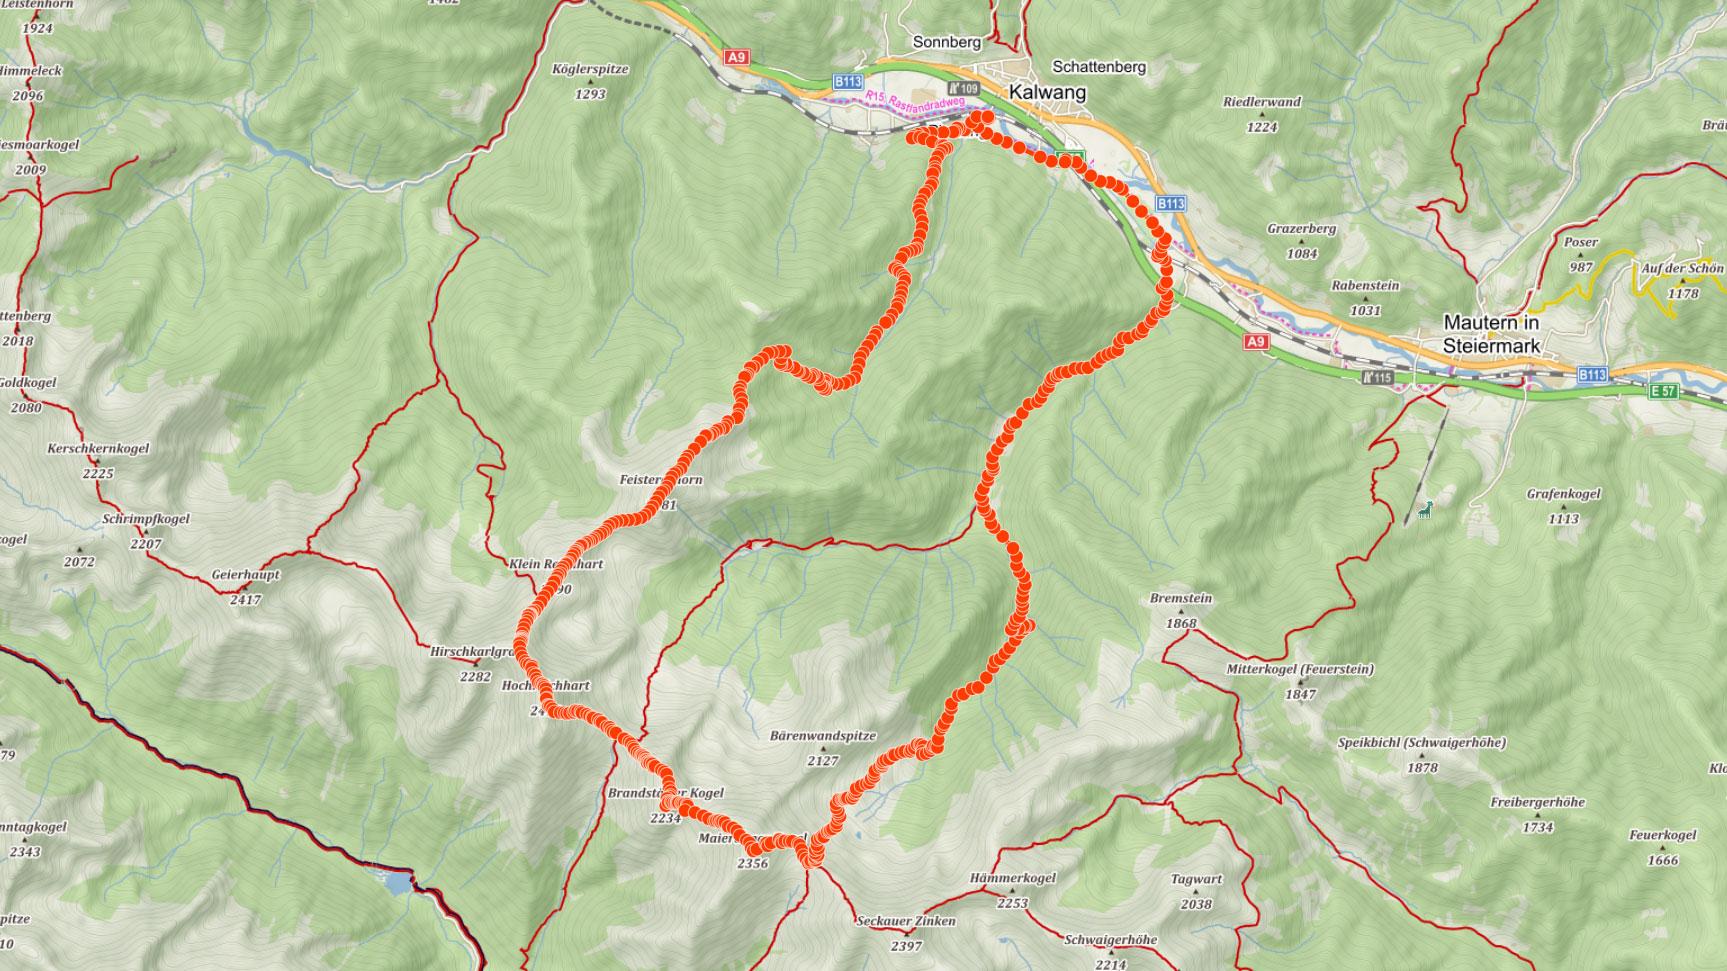 Trasa na Hochreichart a po hřebeni Seckauských Alp v Rakousku